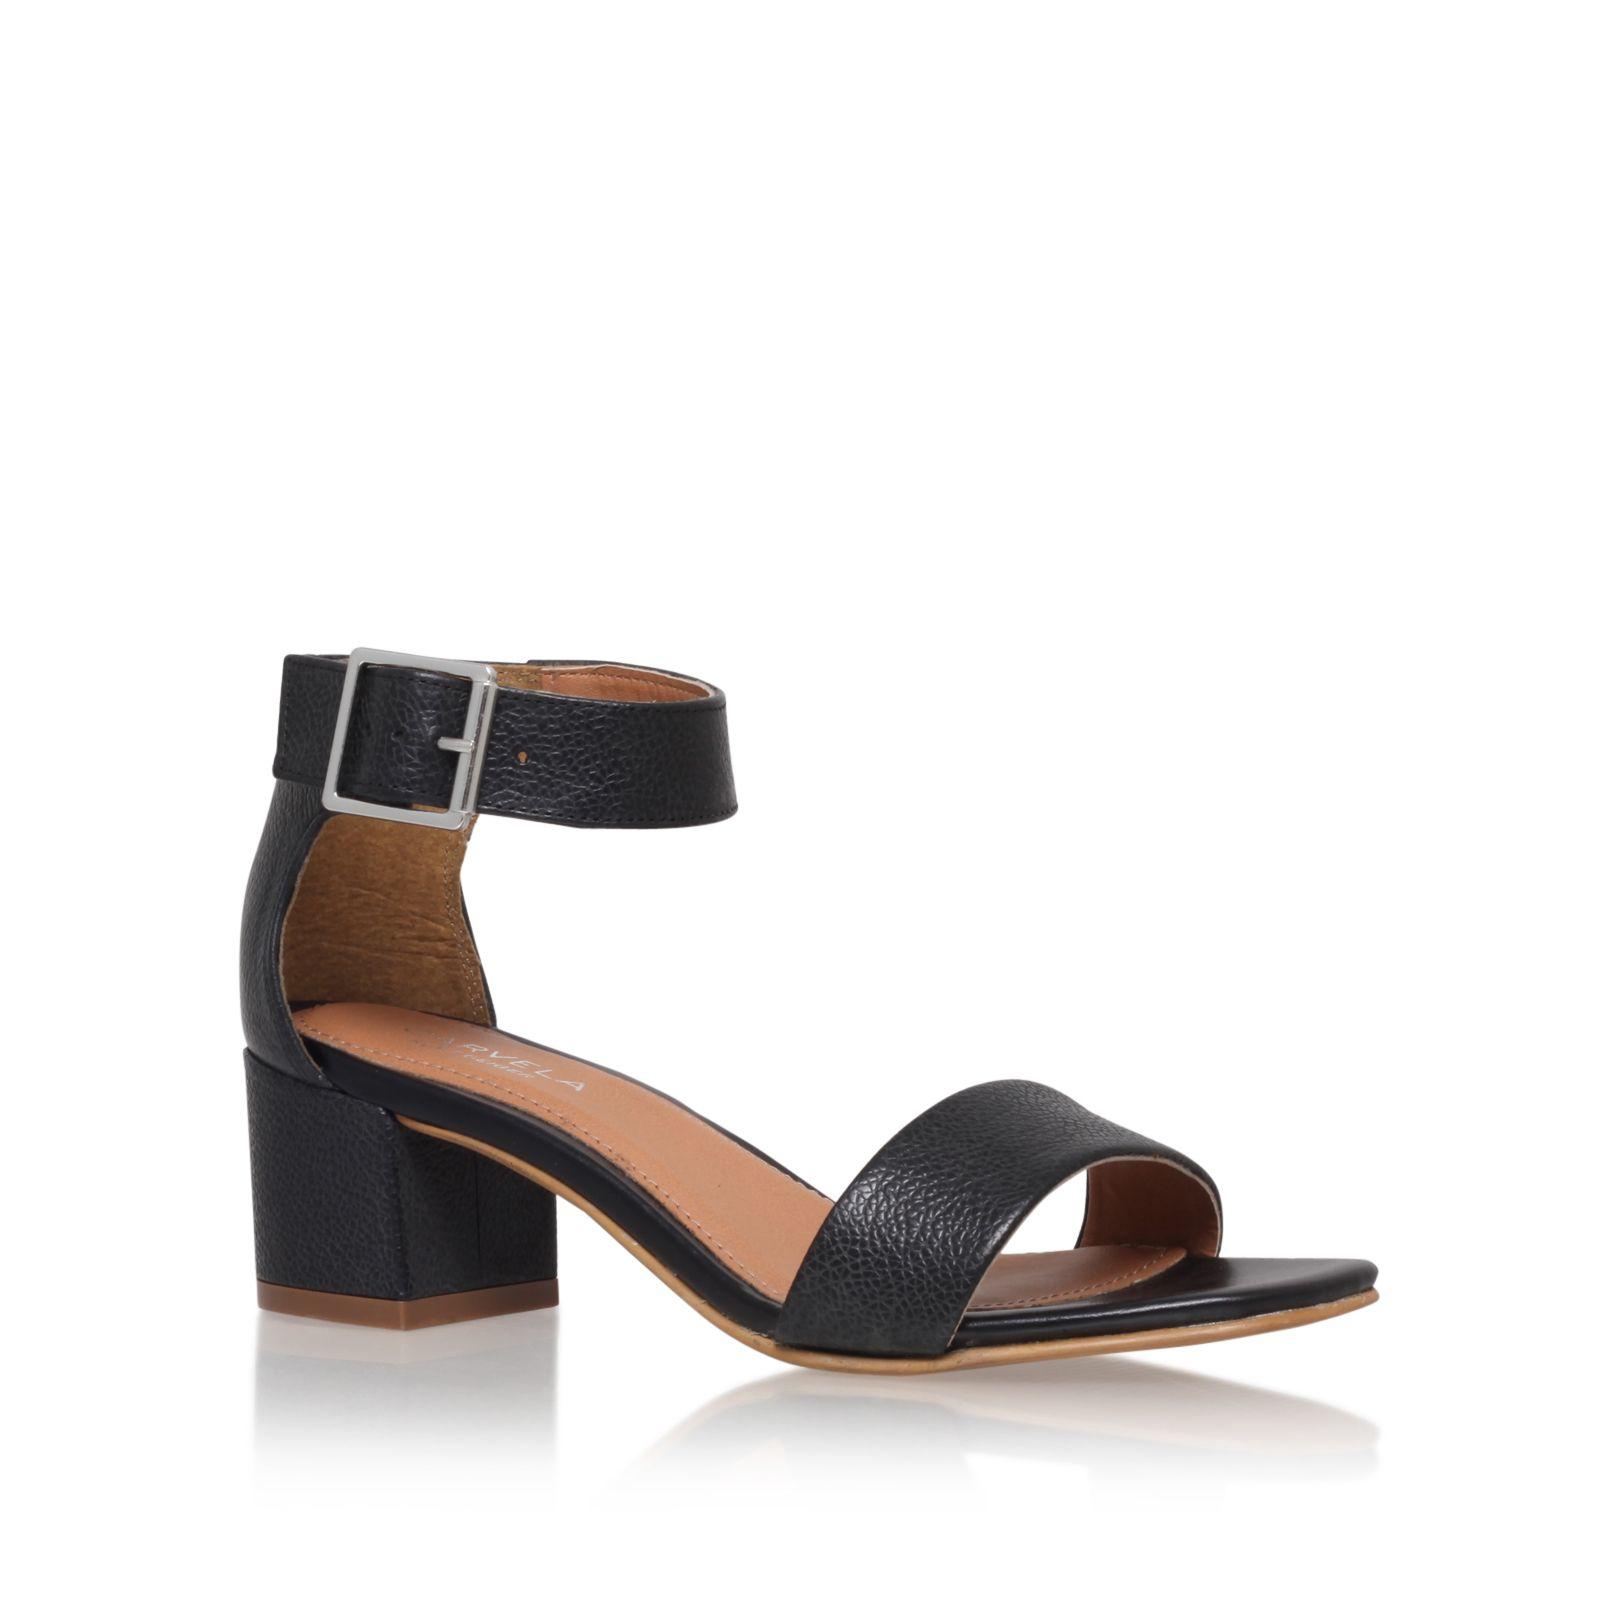 Kurt Geiger Black Wedge Shoes